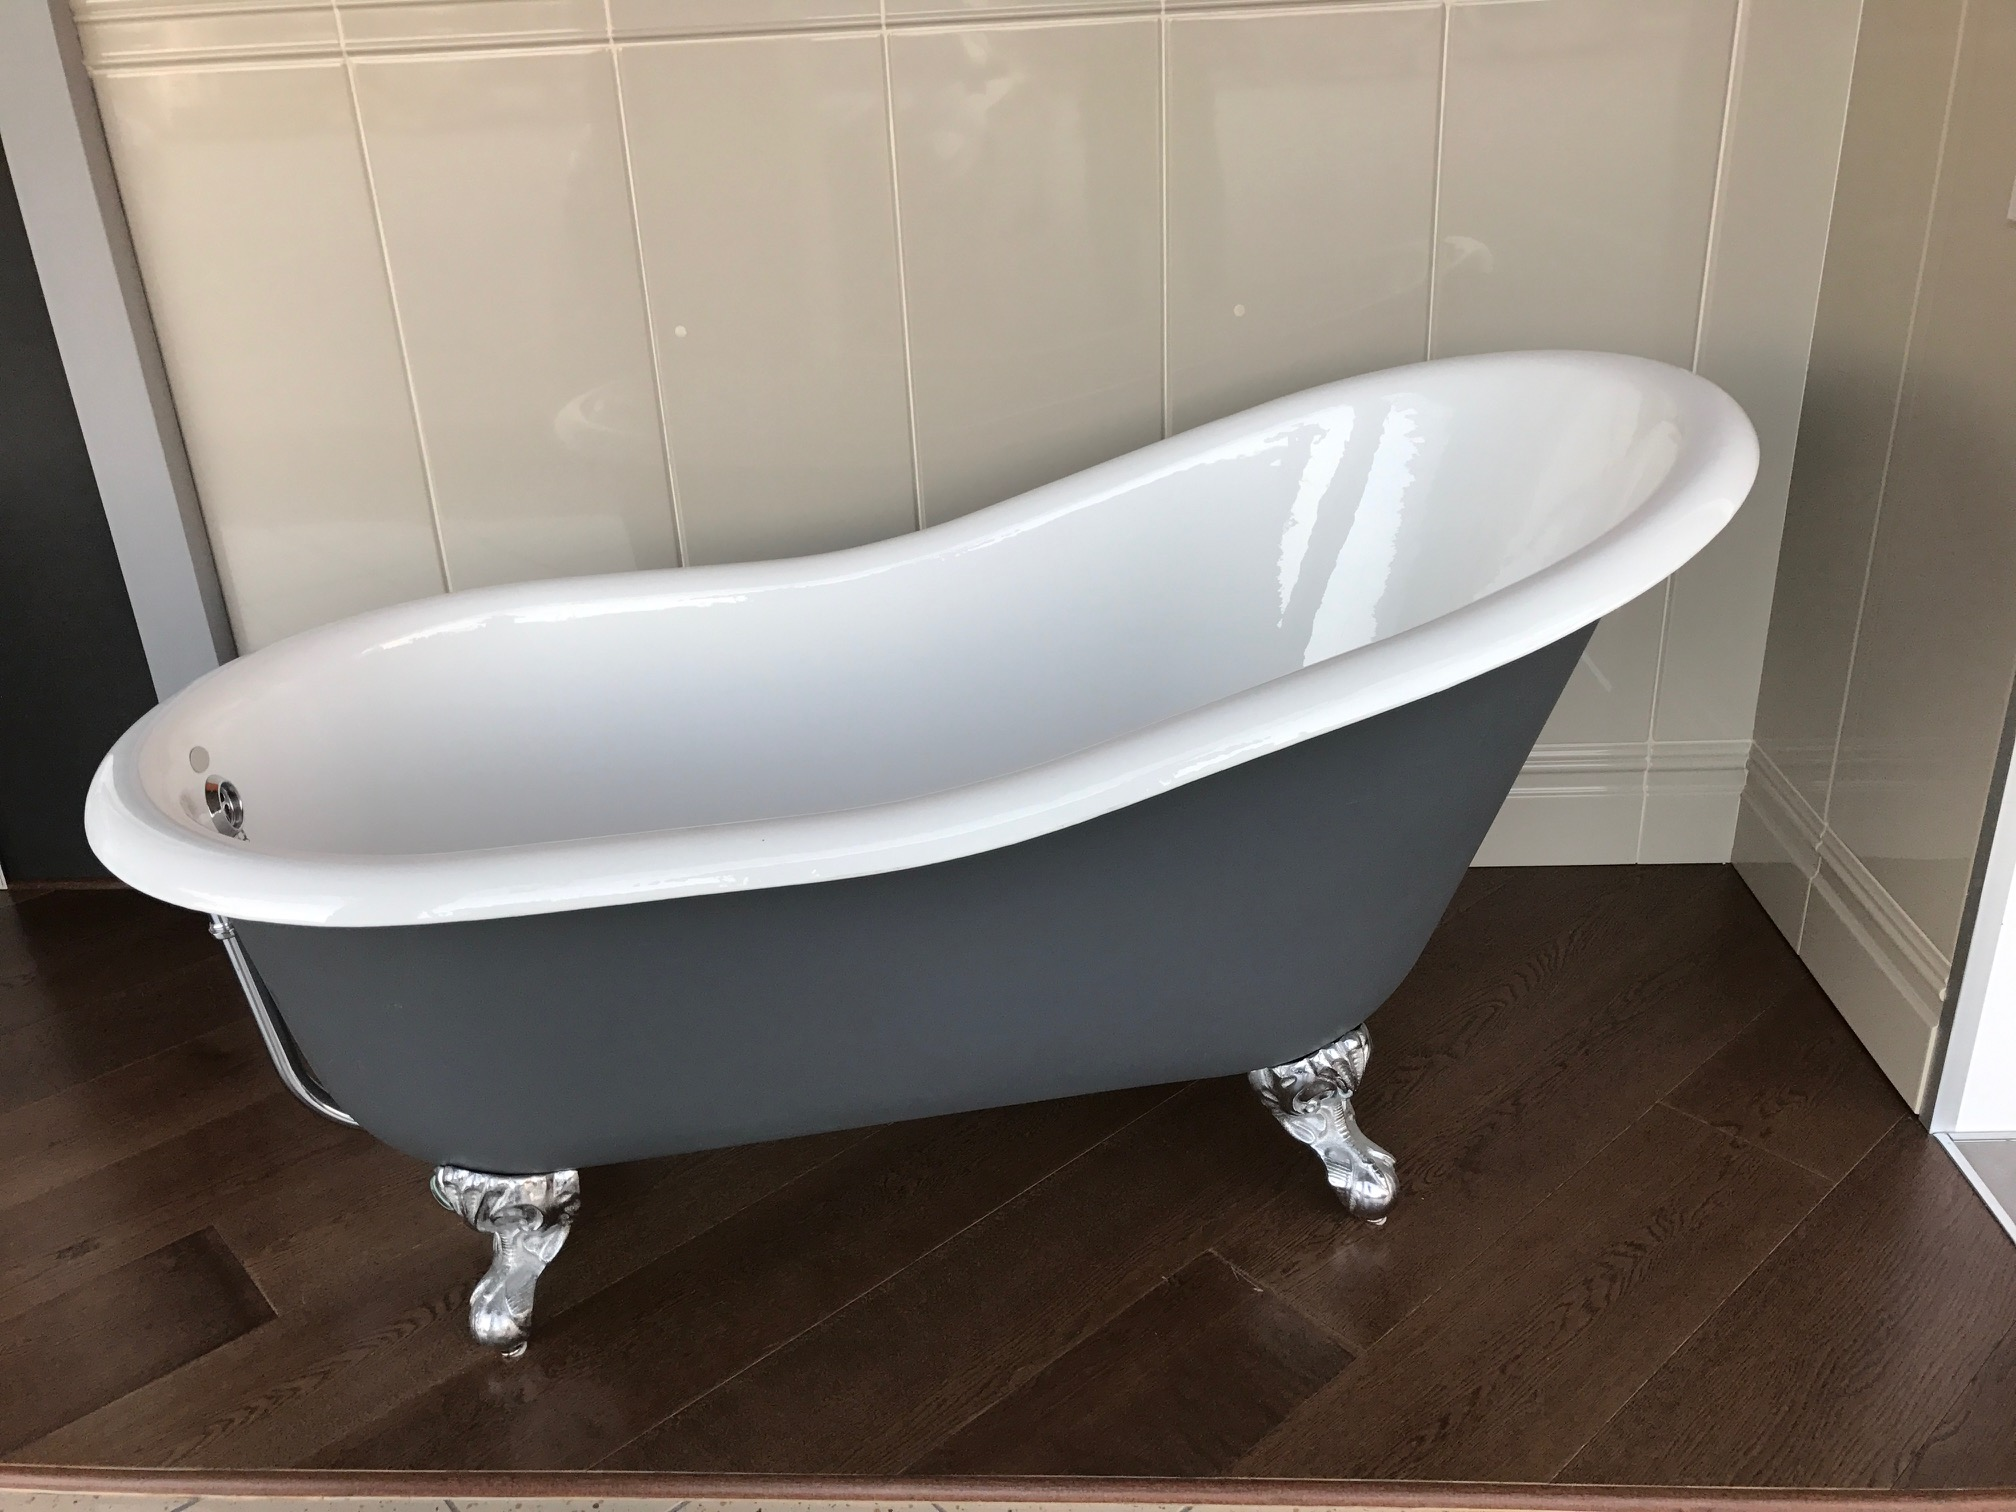 Vasca Da Bagno Ghisa : Vasca da bagno in ghisa modello slipper euroedil